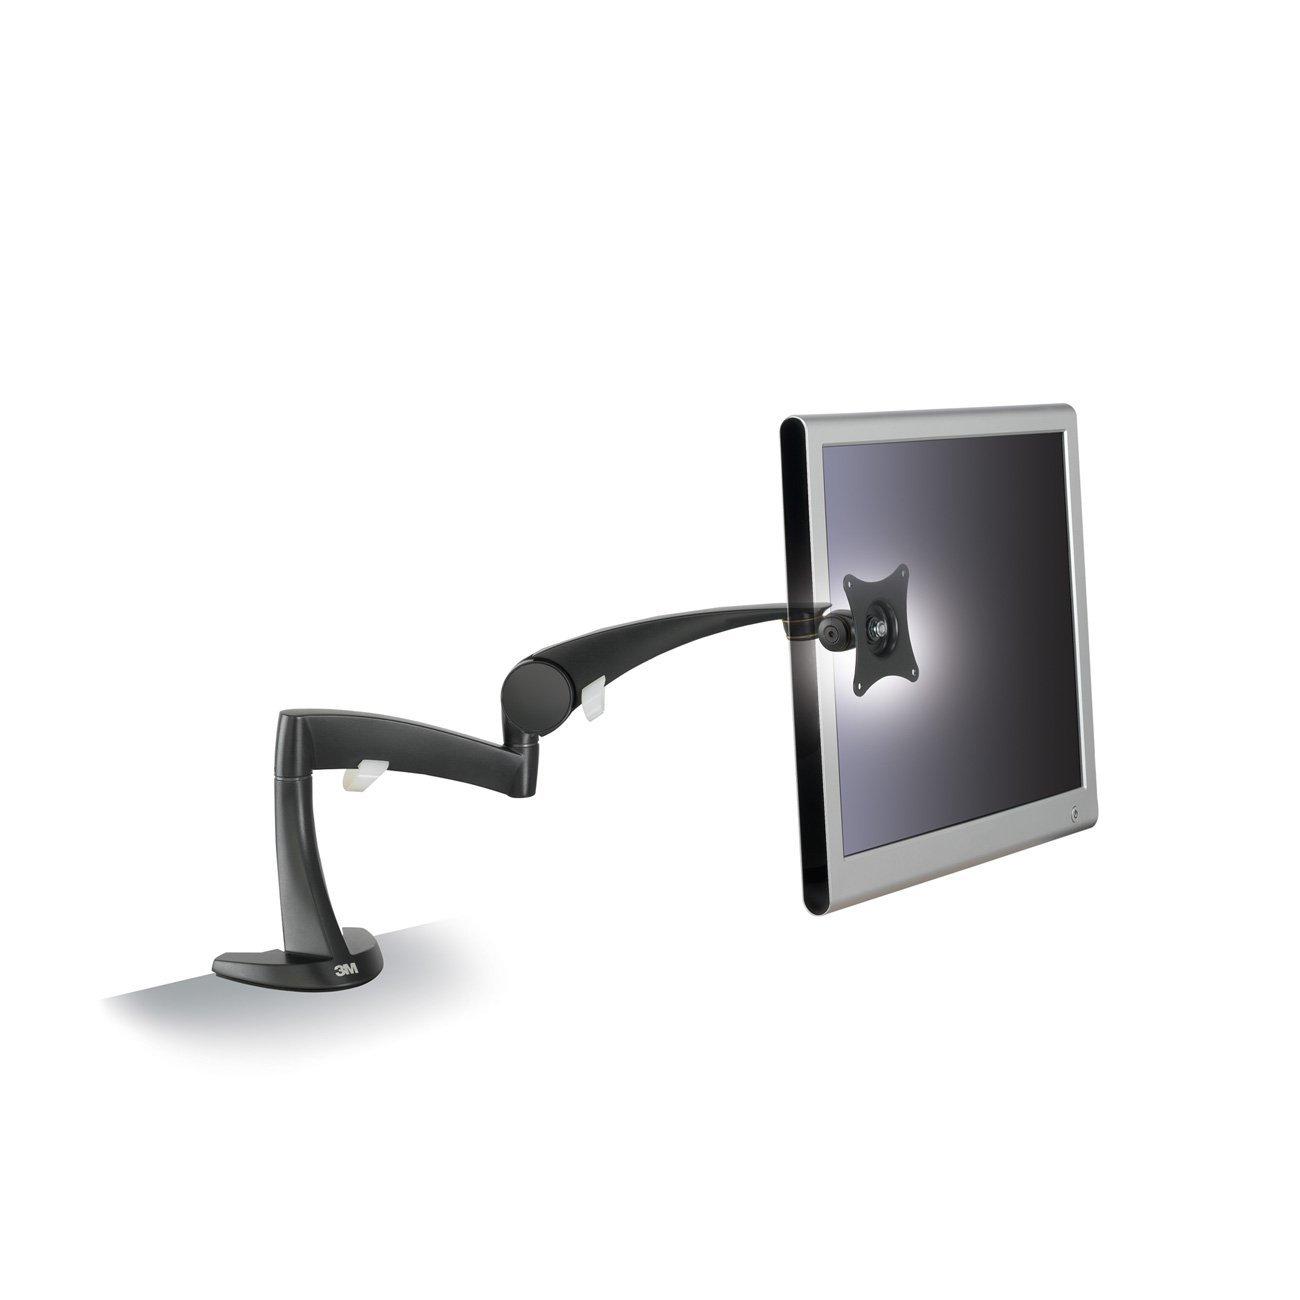 3M Mechanically Adjustable Monitor Arm (MA100MB)